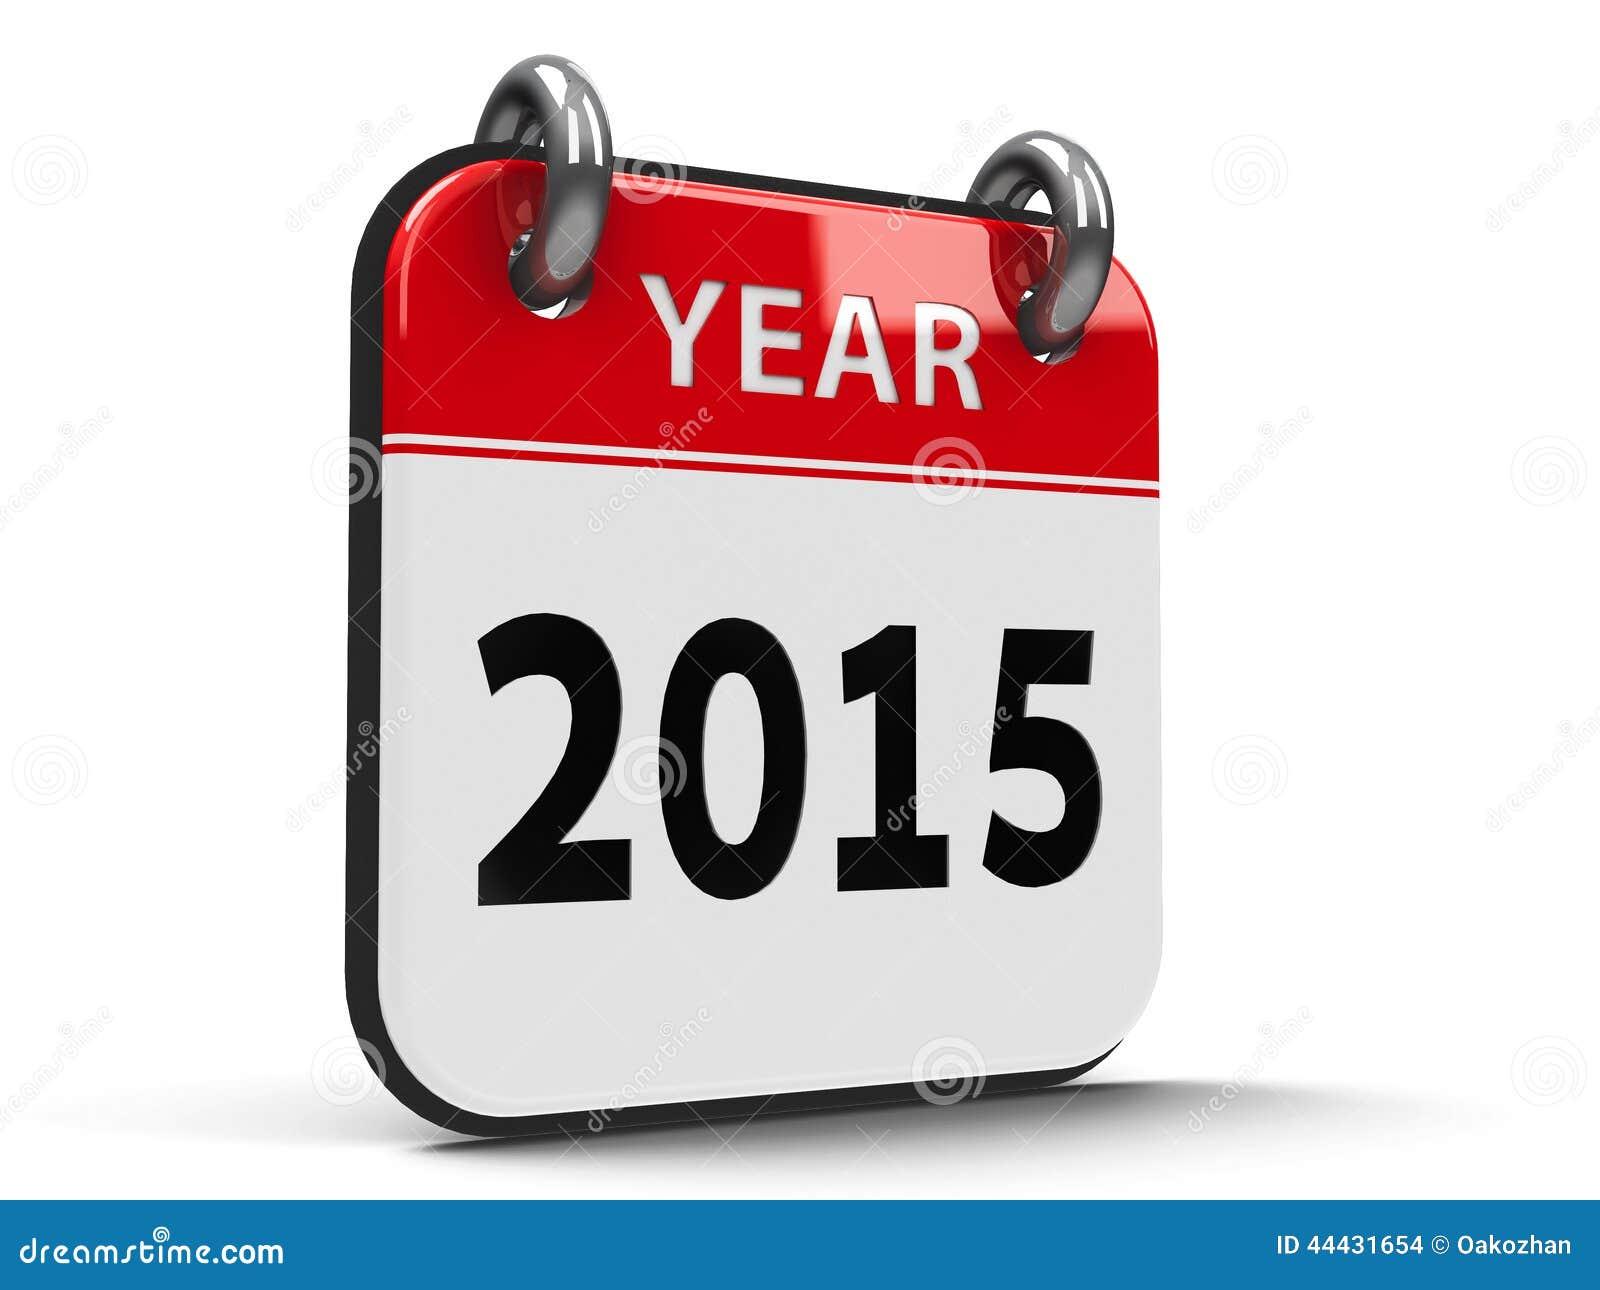 Icon Calendar 2015 Year Isometry Stock Illustration - Image: 44431654